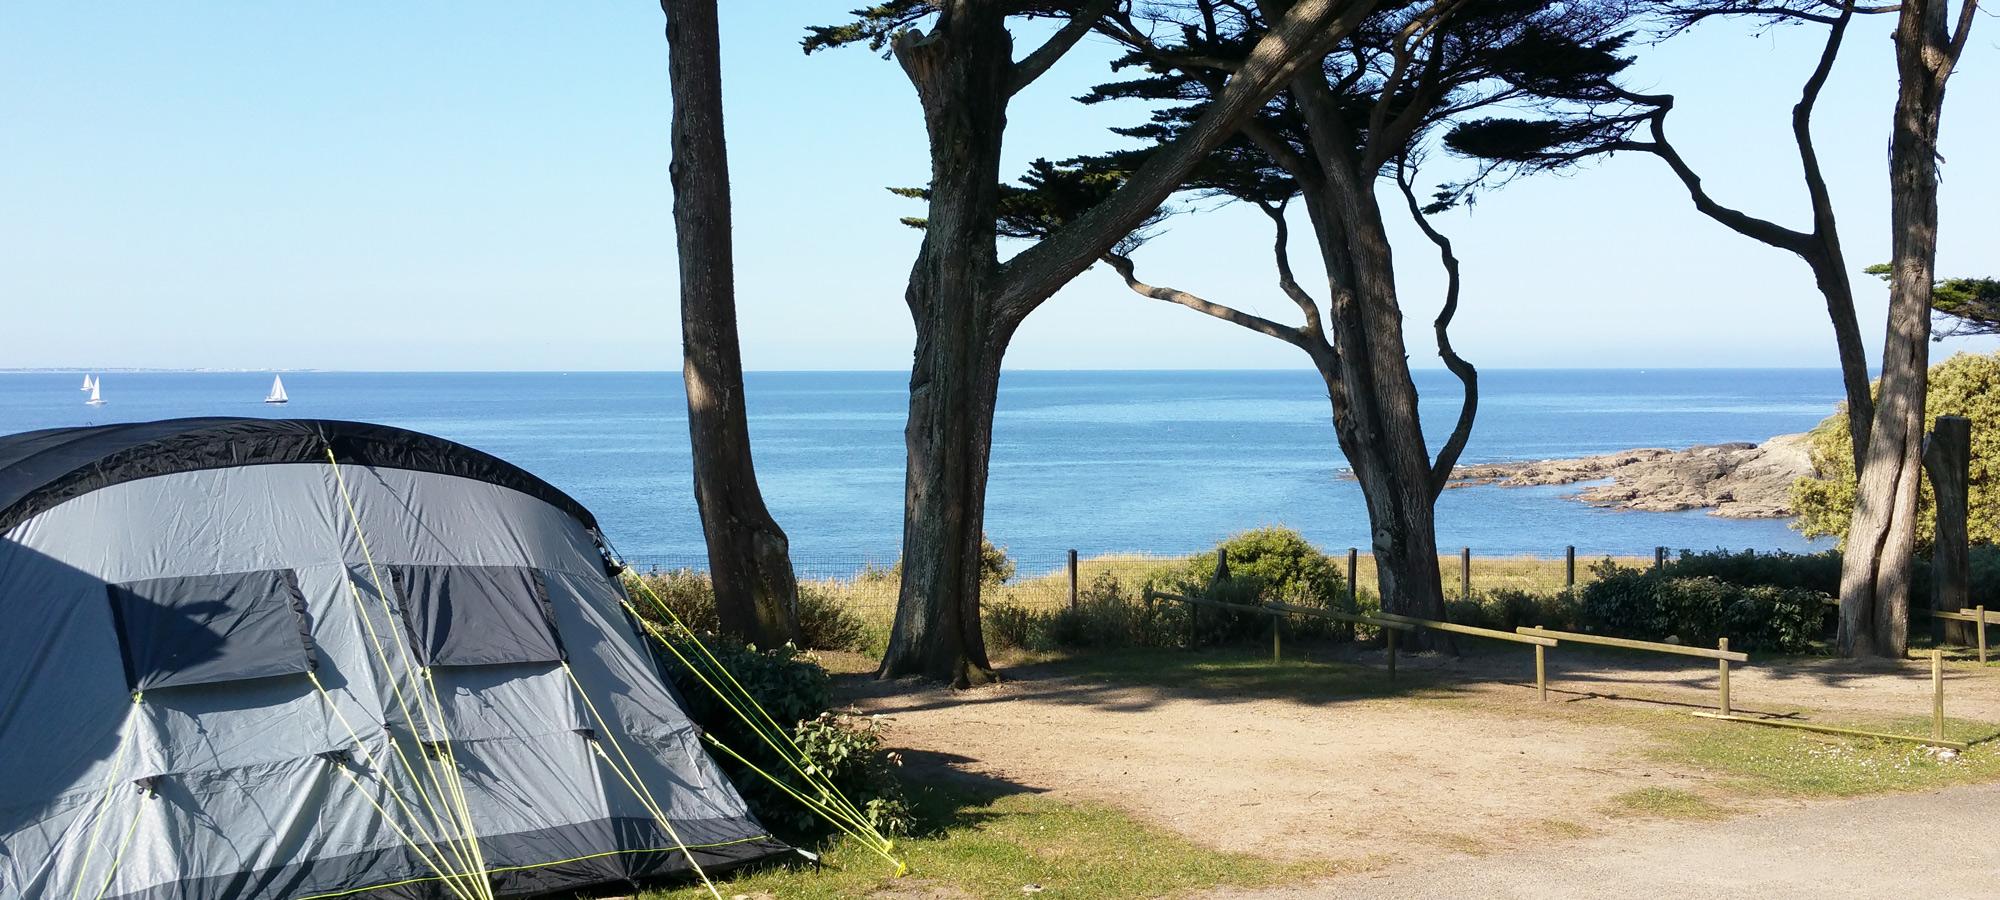 Camping Loire Atlantique en bord de mer